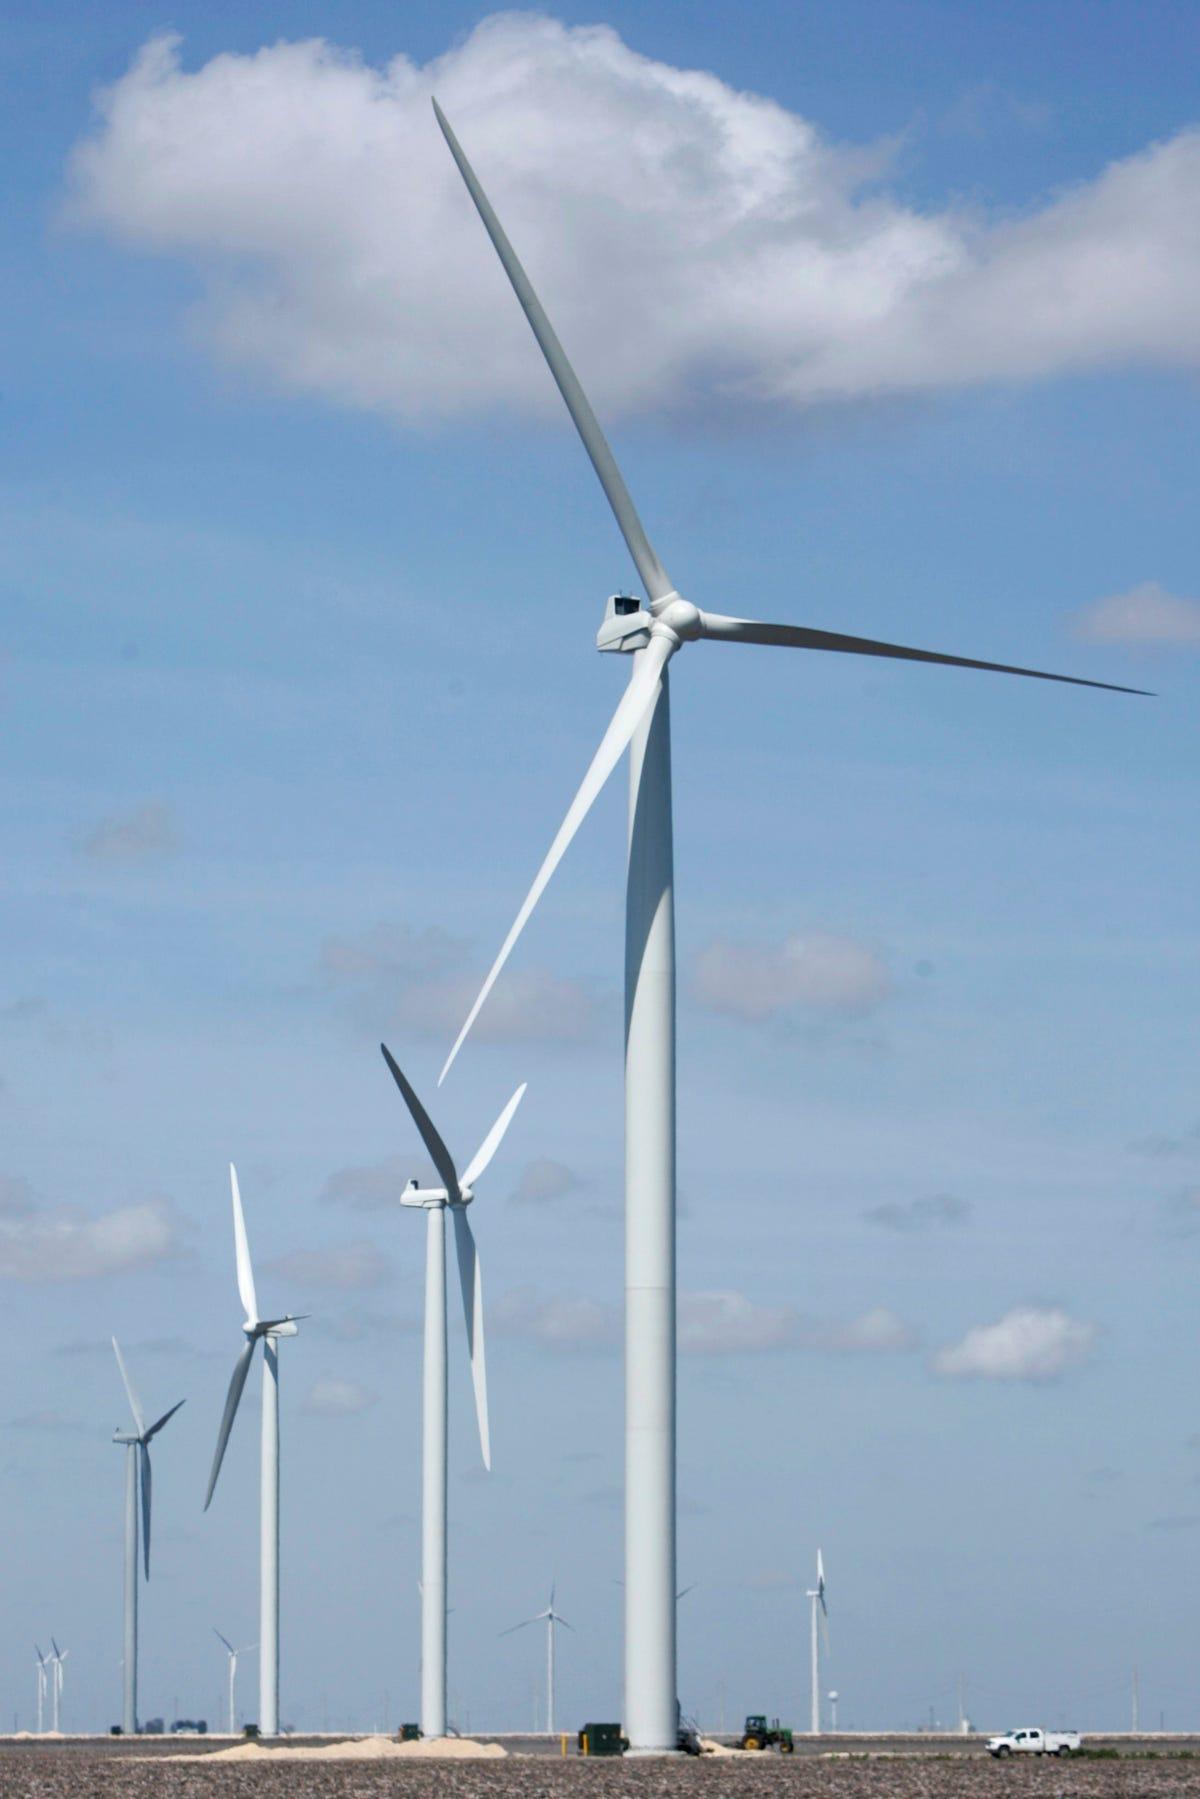 Wind energy is helping Texas keep the lights on